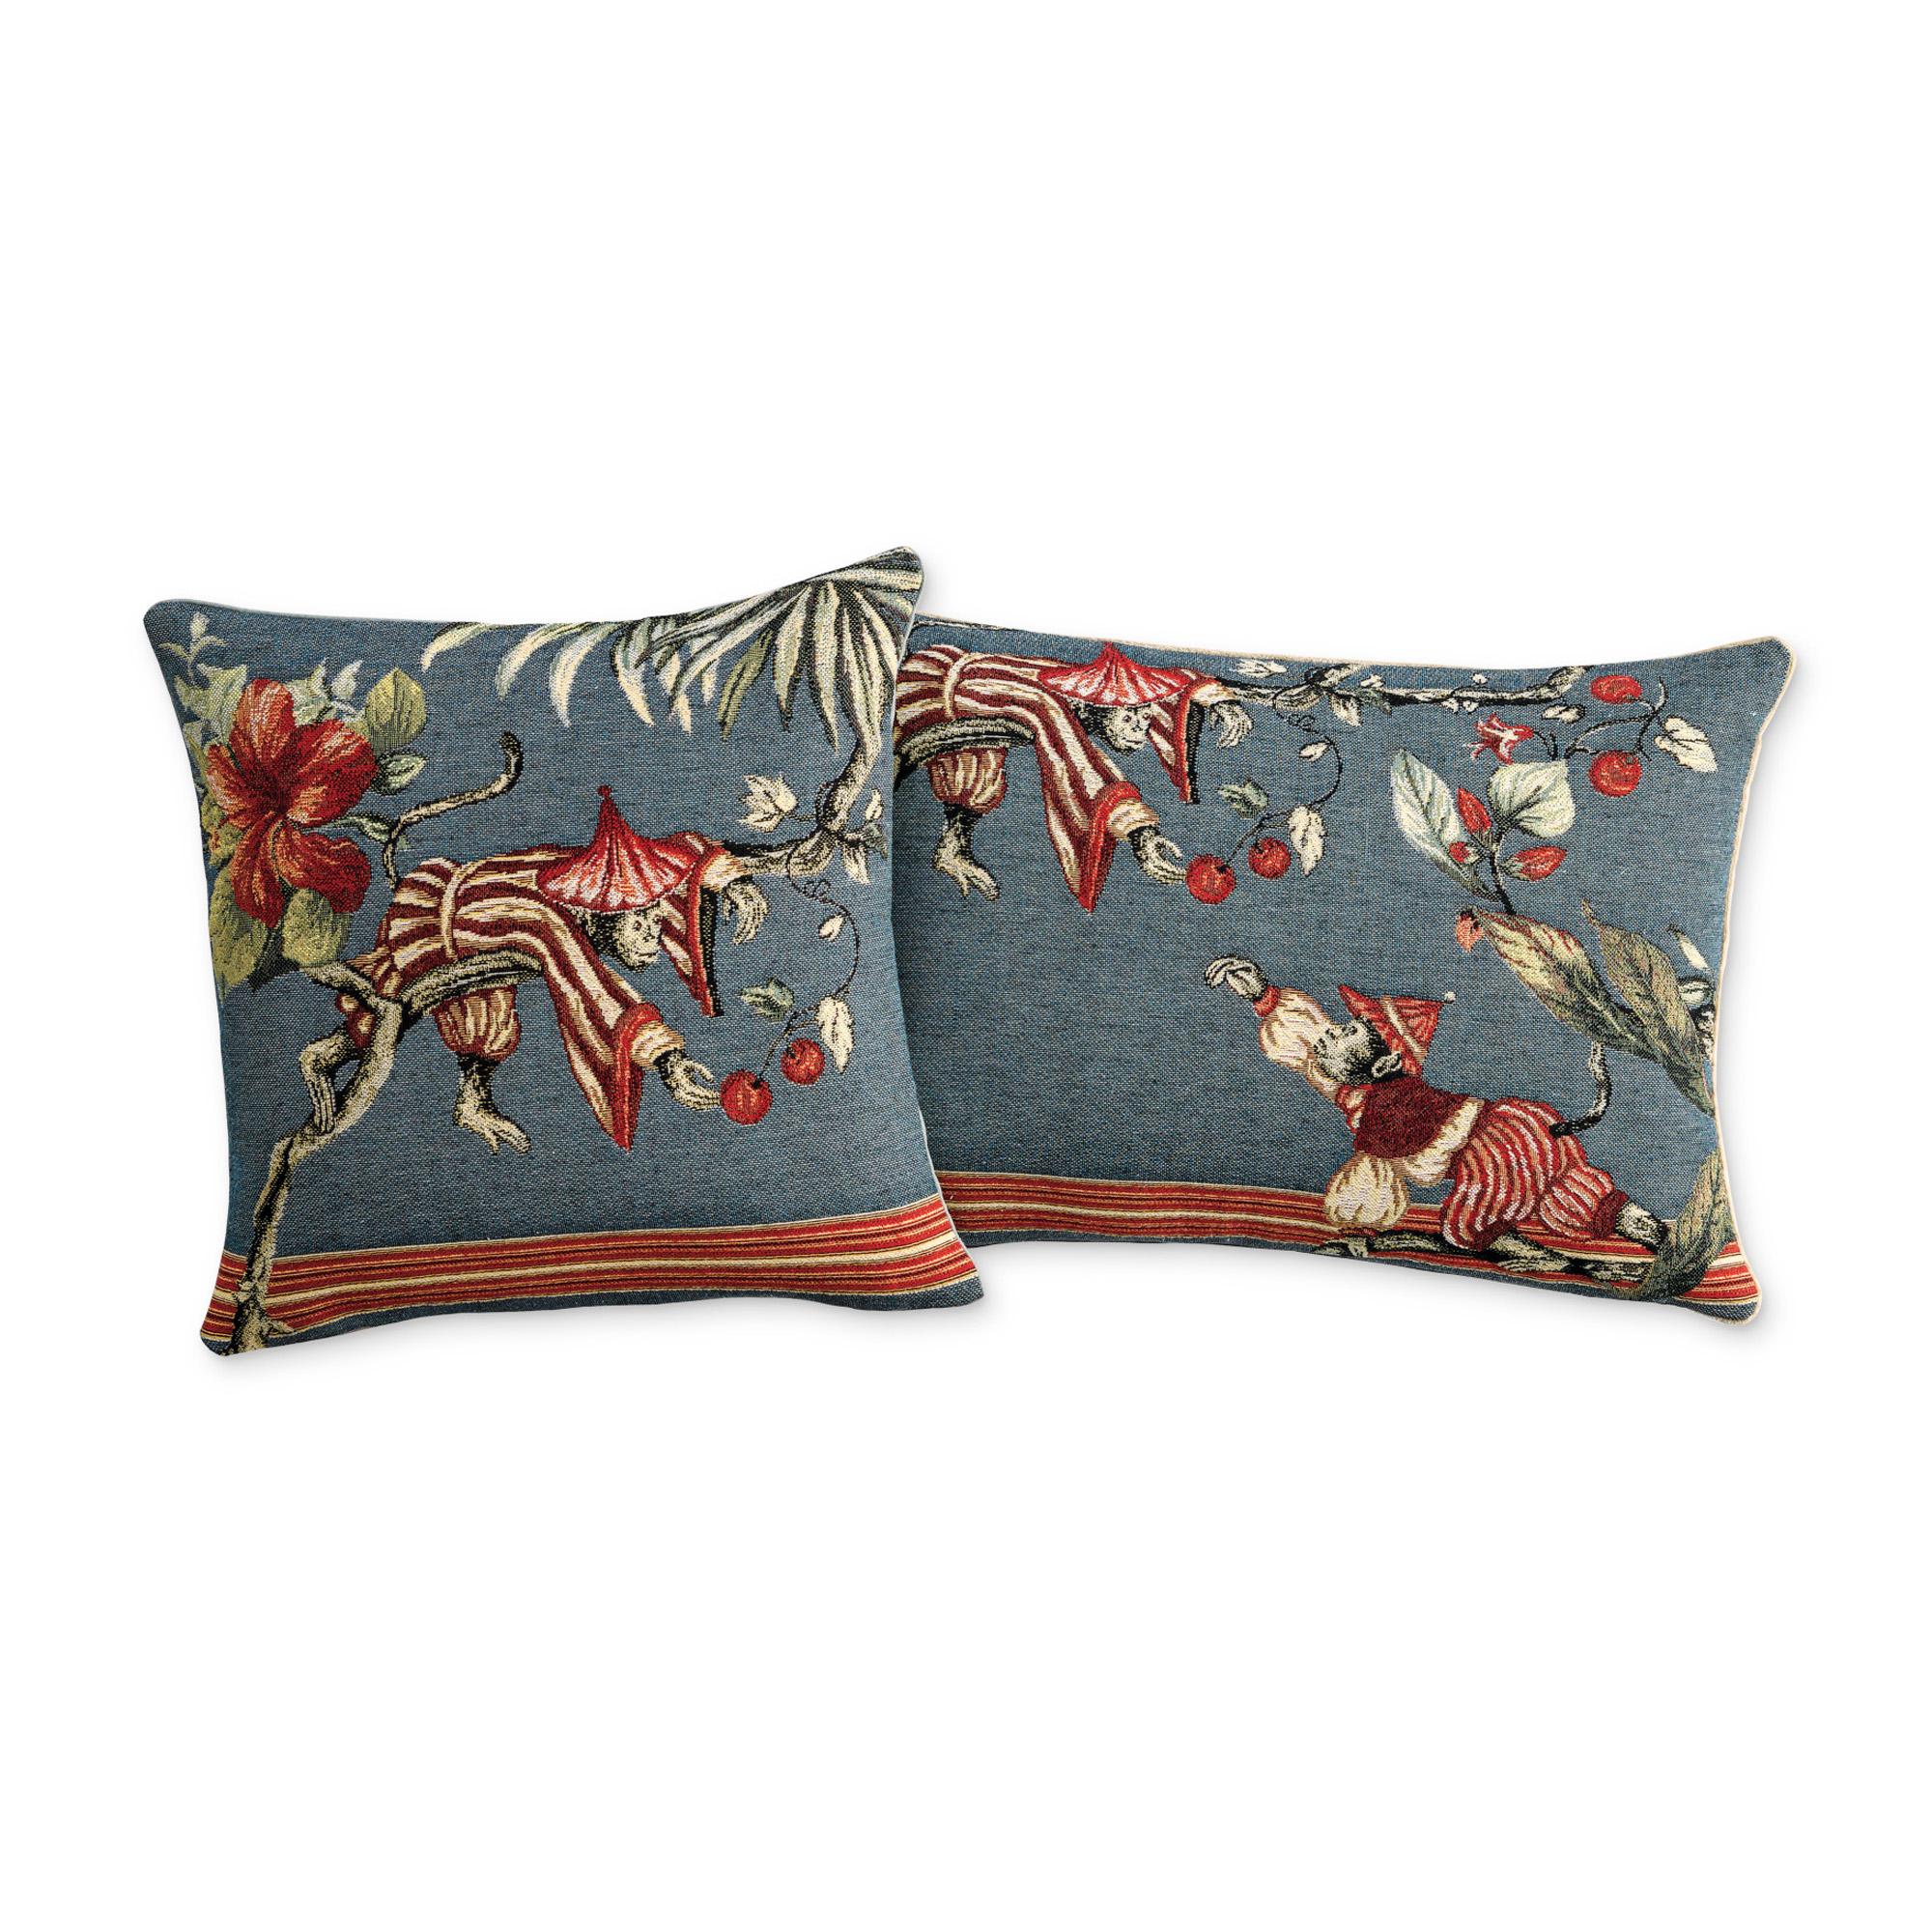 Chinoiserie Monkey Pillows Blue  Gumps